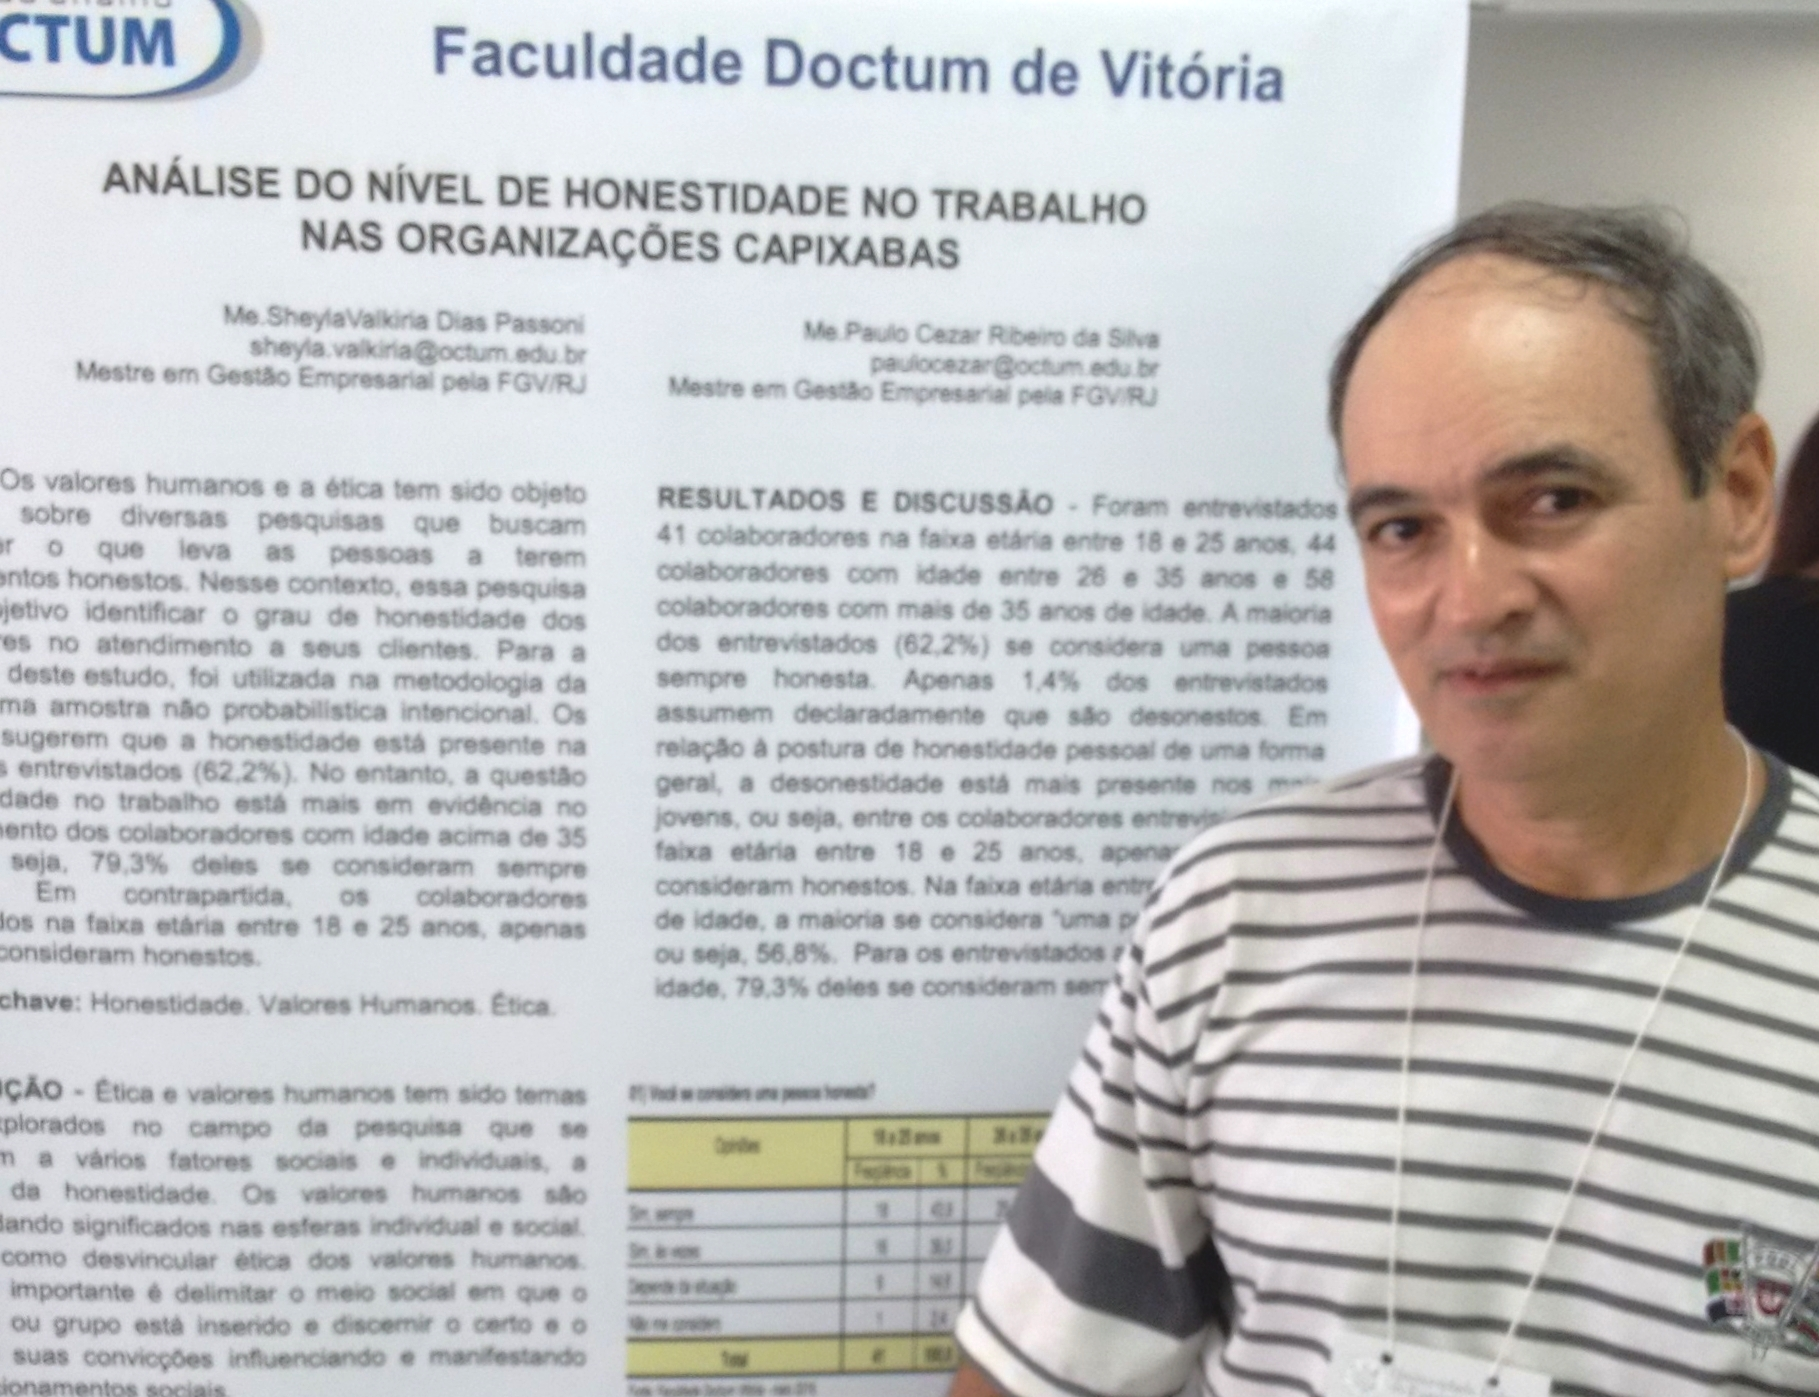 PC JORNADA CIENTIFICA